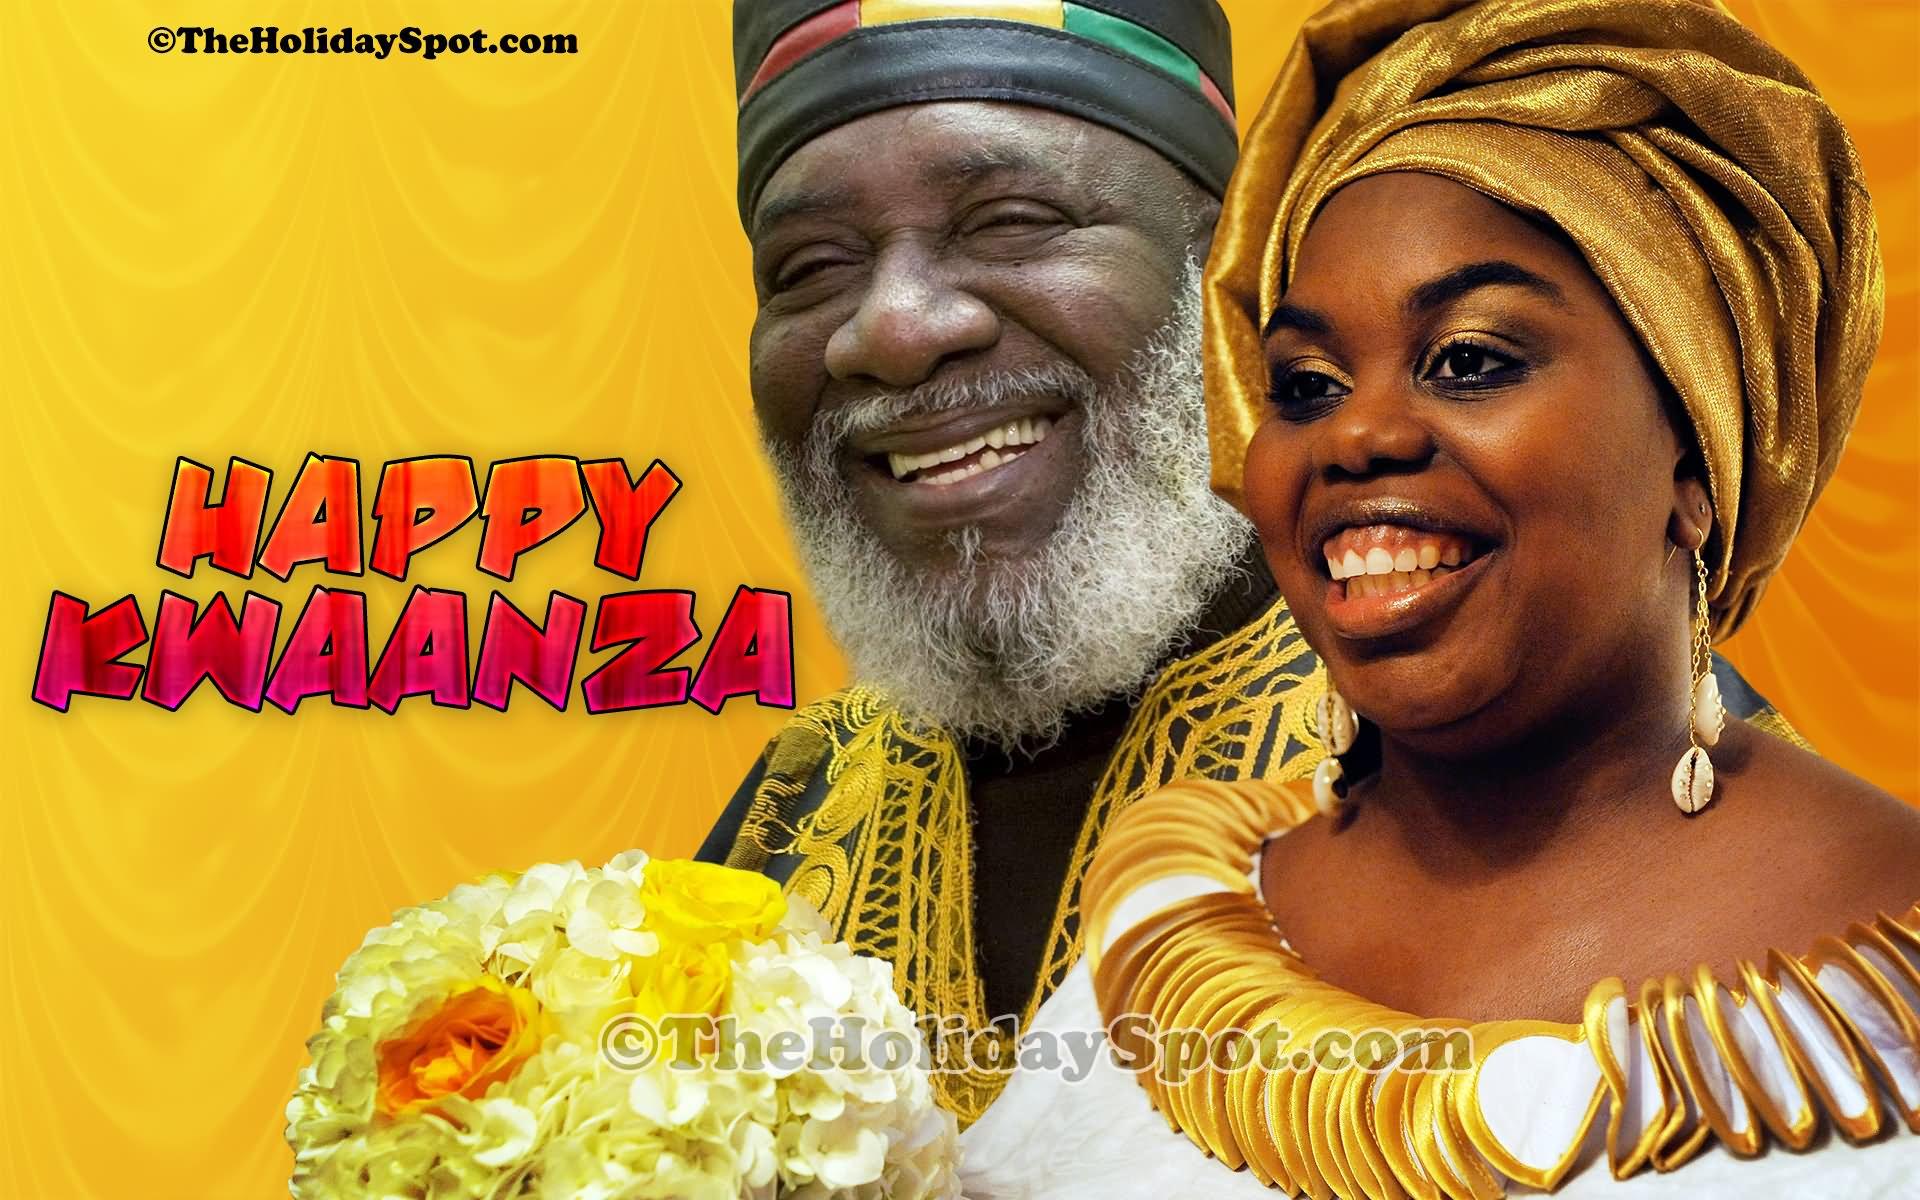 Happy Kwanzaa HD Wallpaper 1920x1200